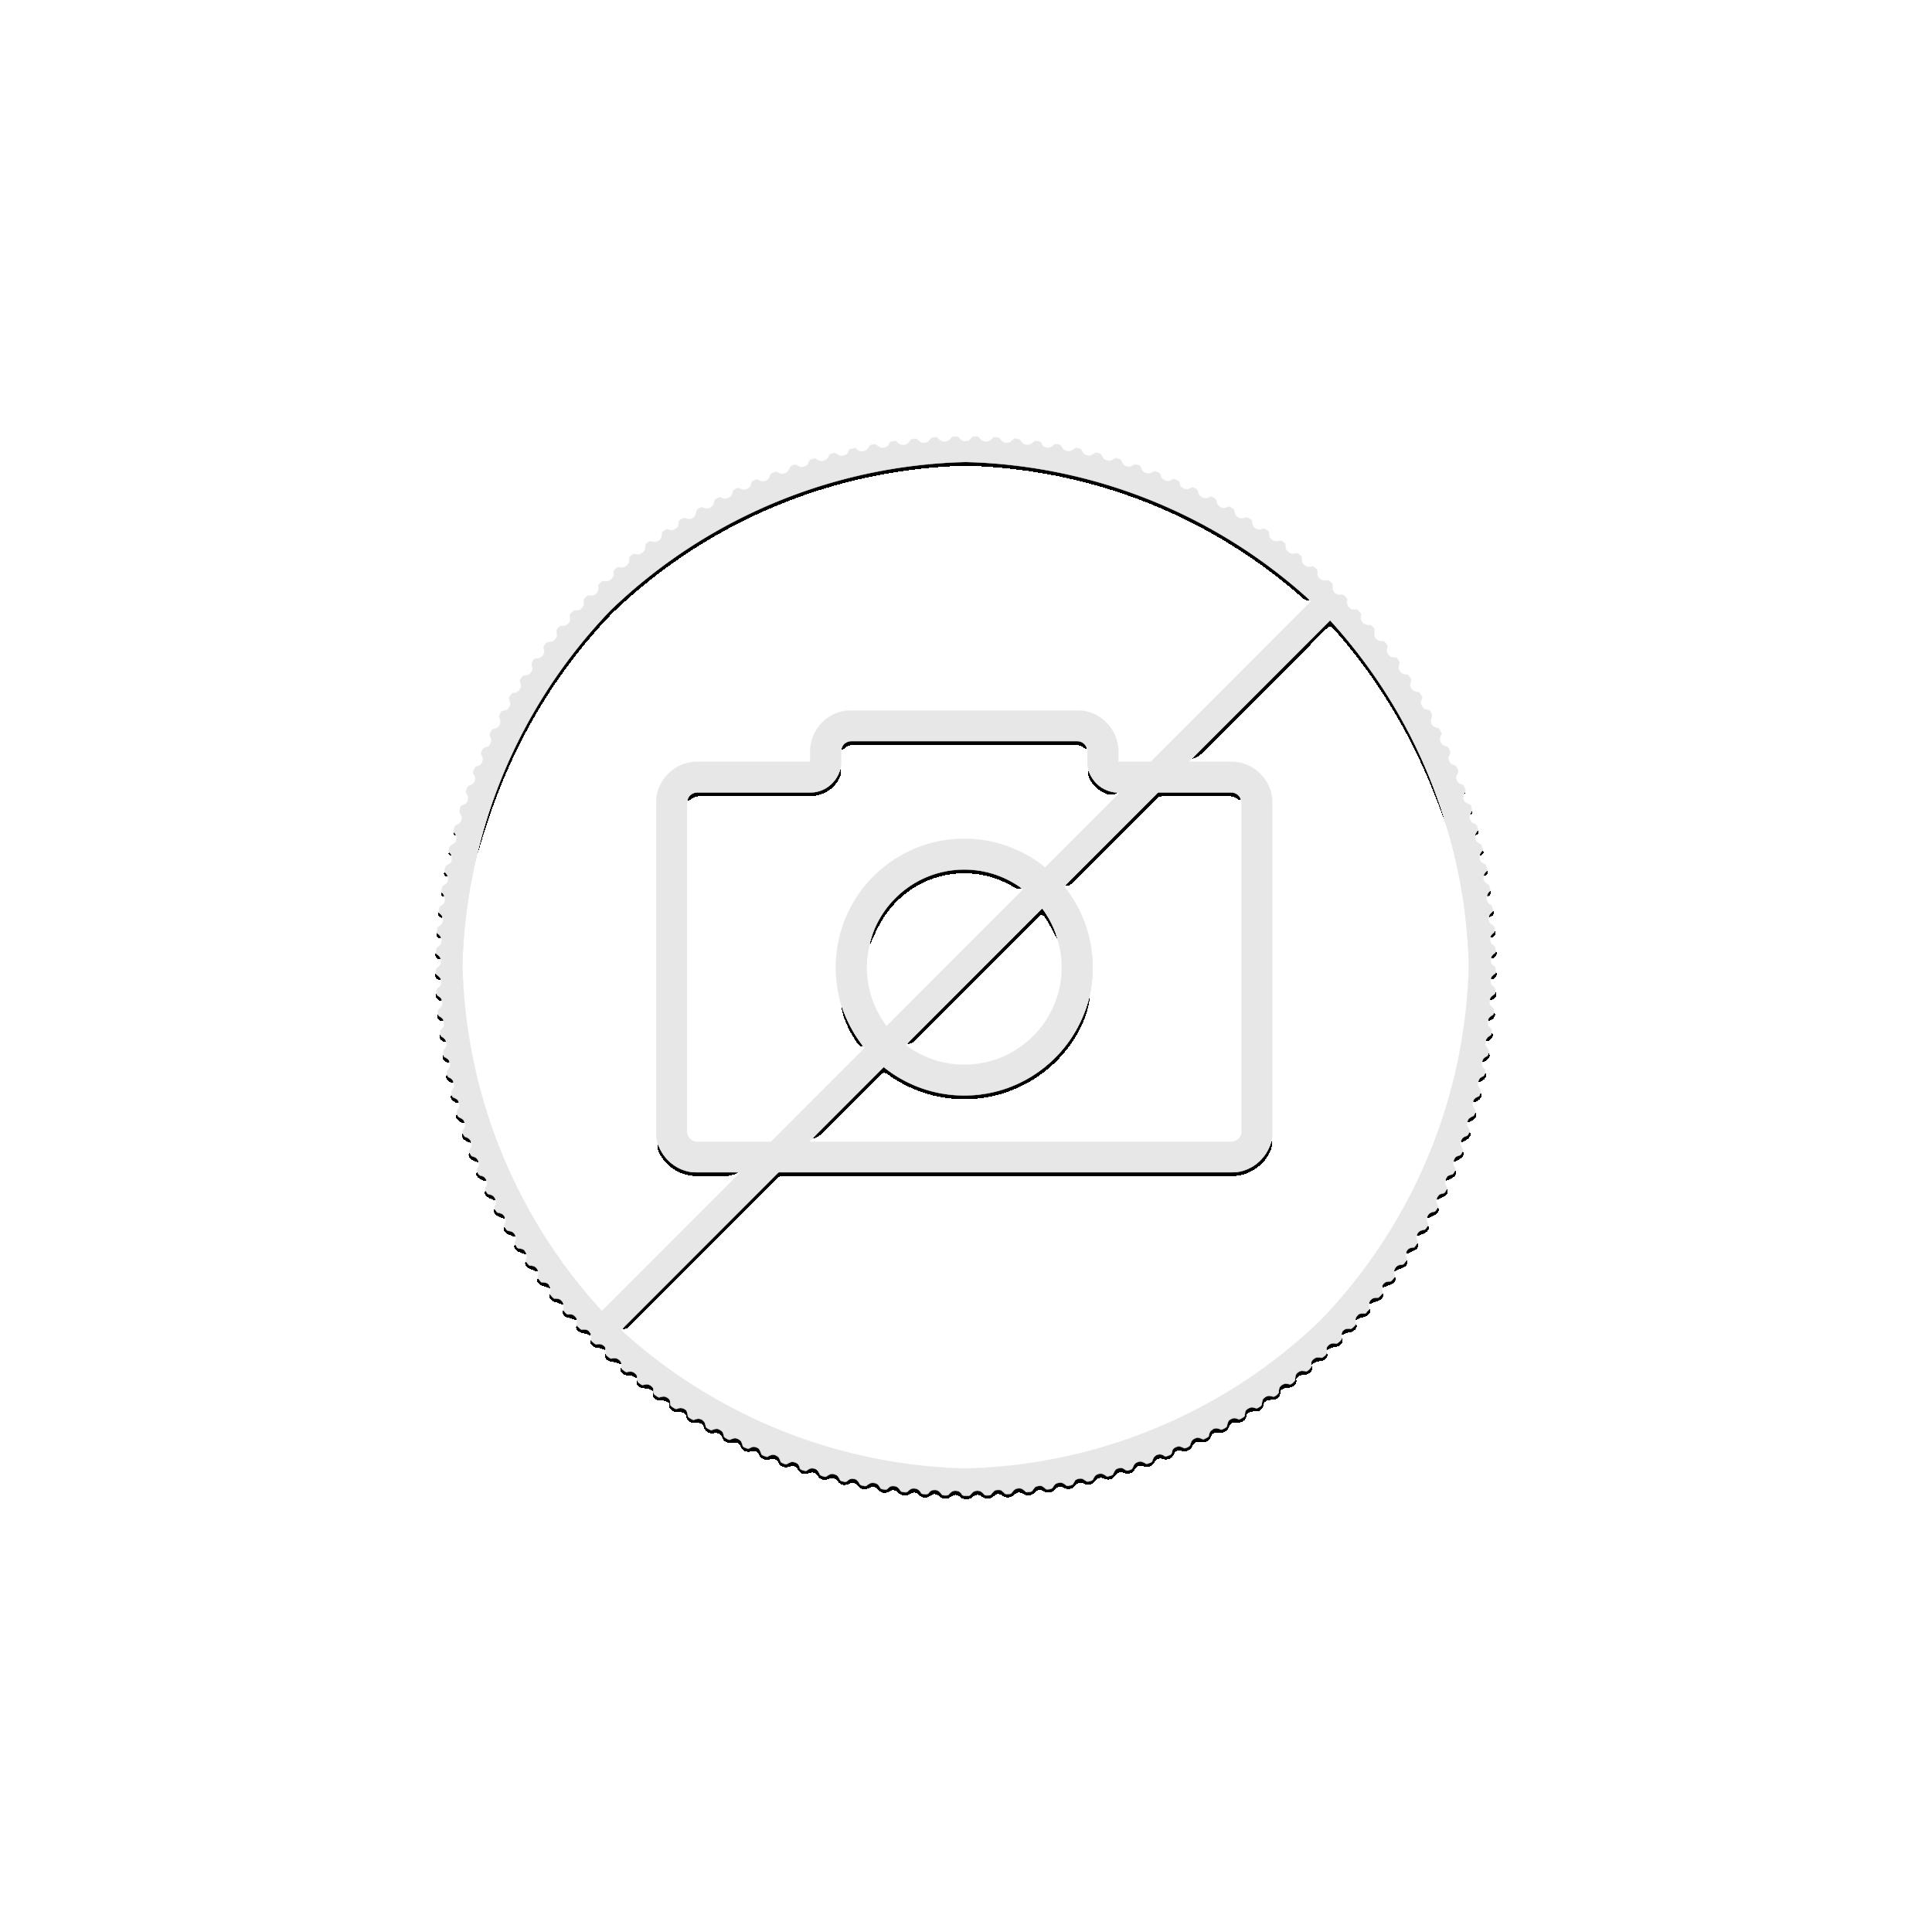 1 troy ounce gouden Britannia munt